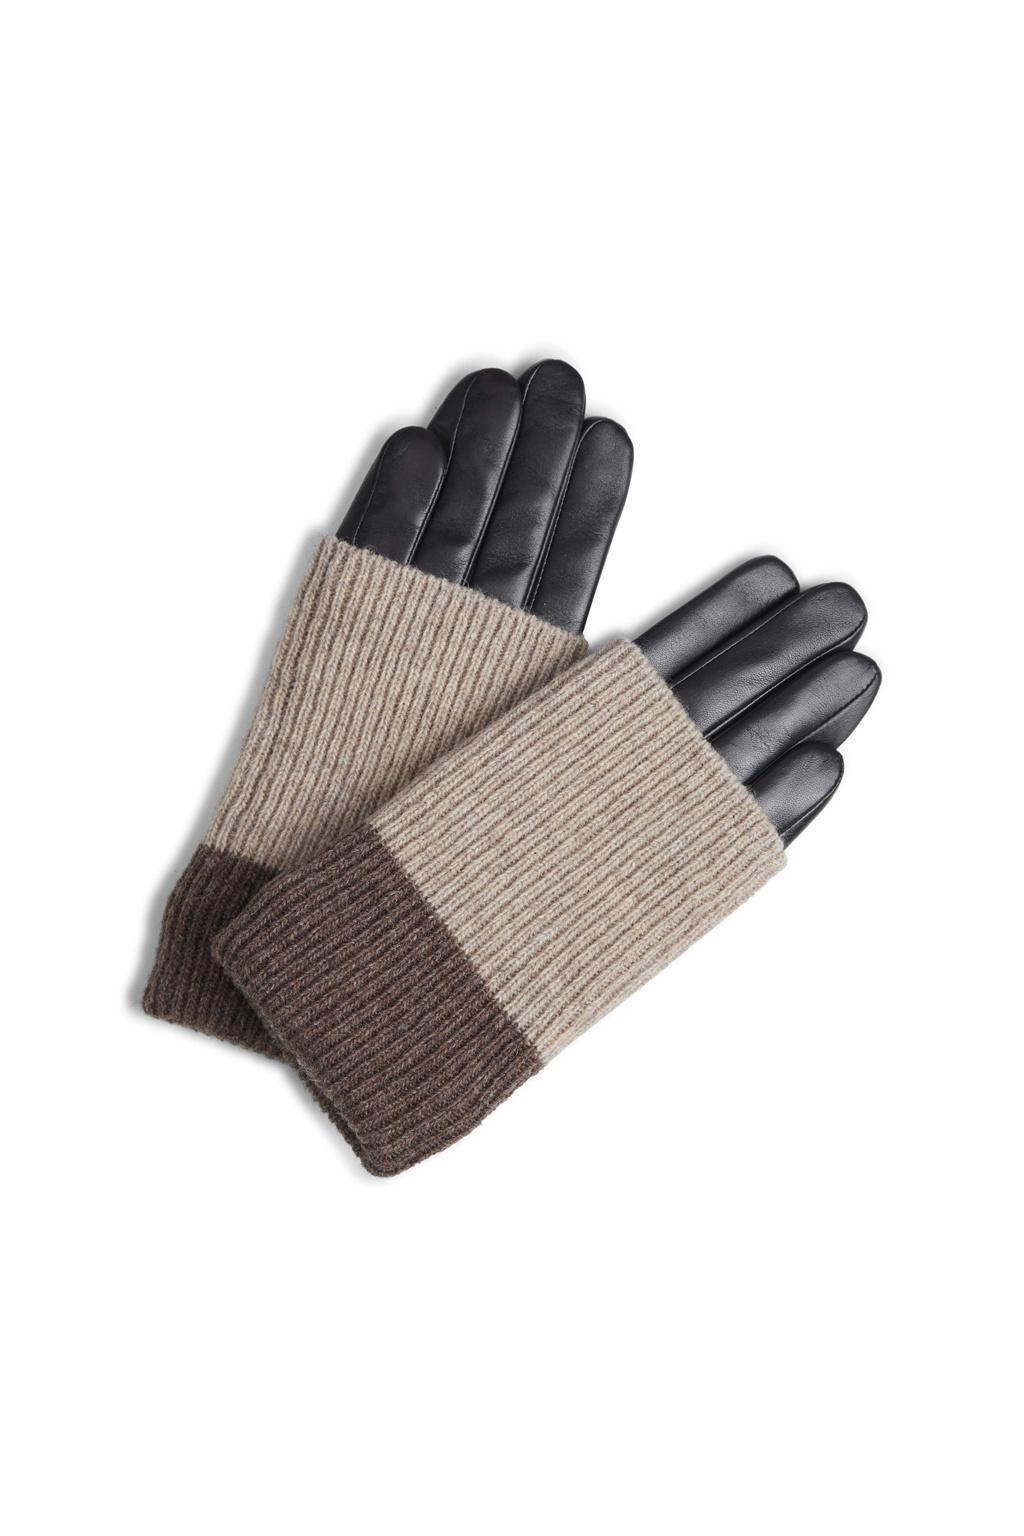 Helly Glove - Black w/ Creme + Hazel-1